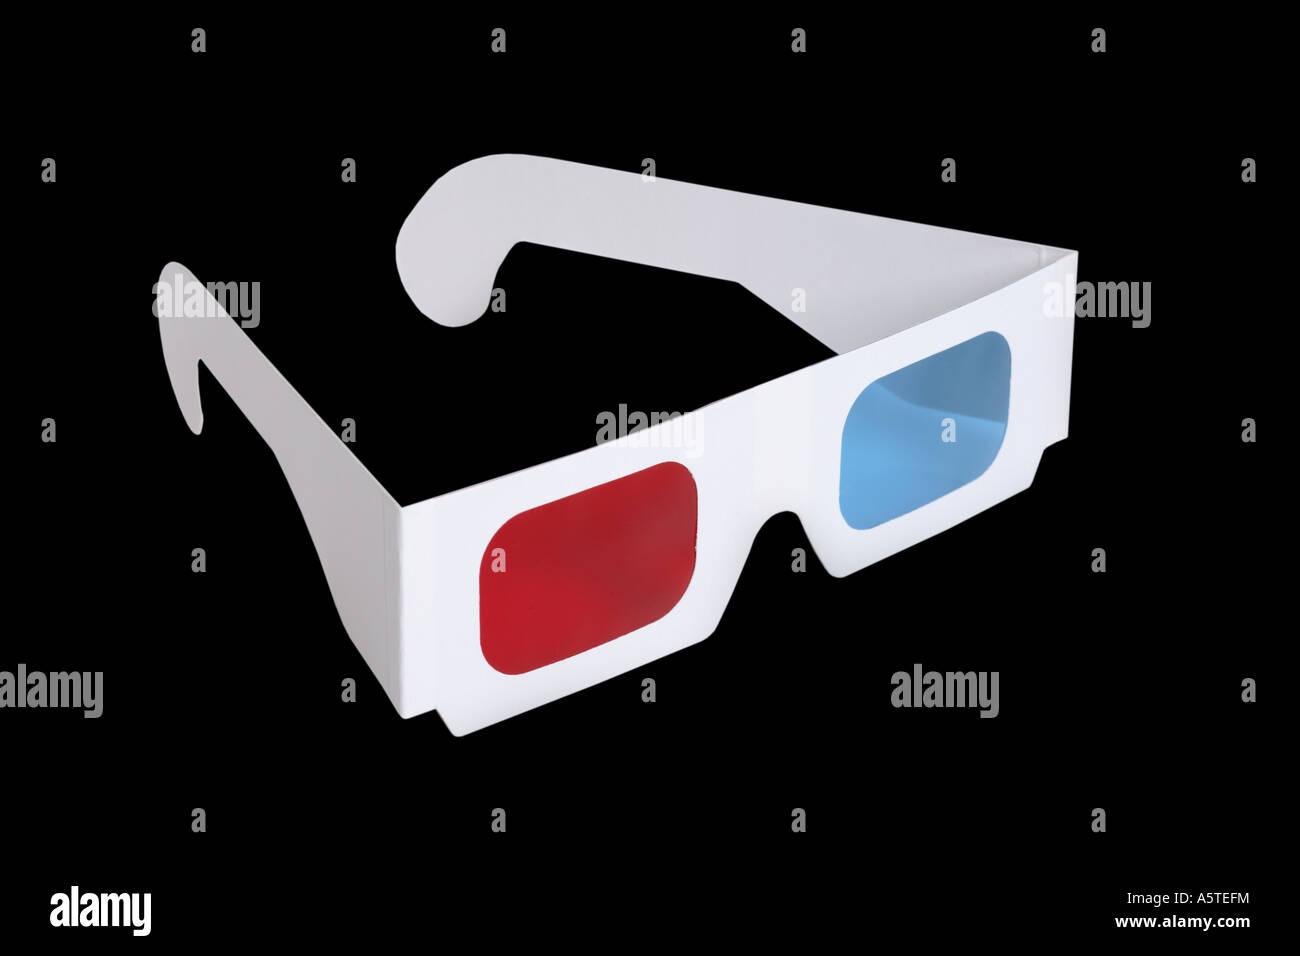 3-D glasses on black background - Stock Image